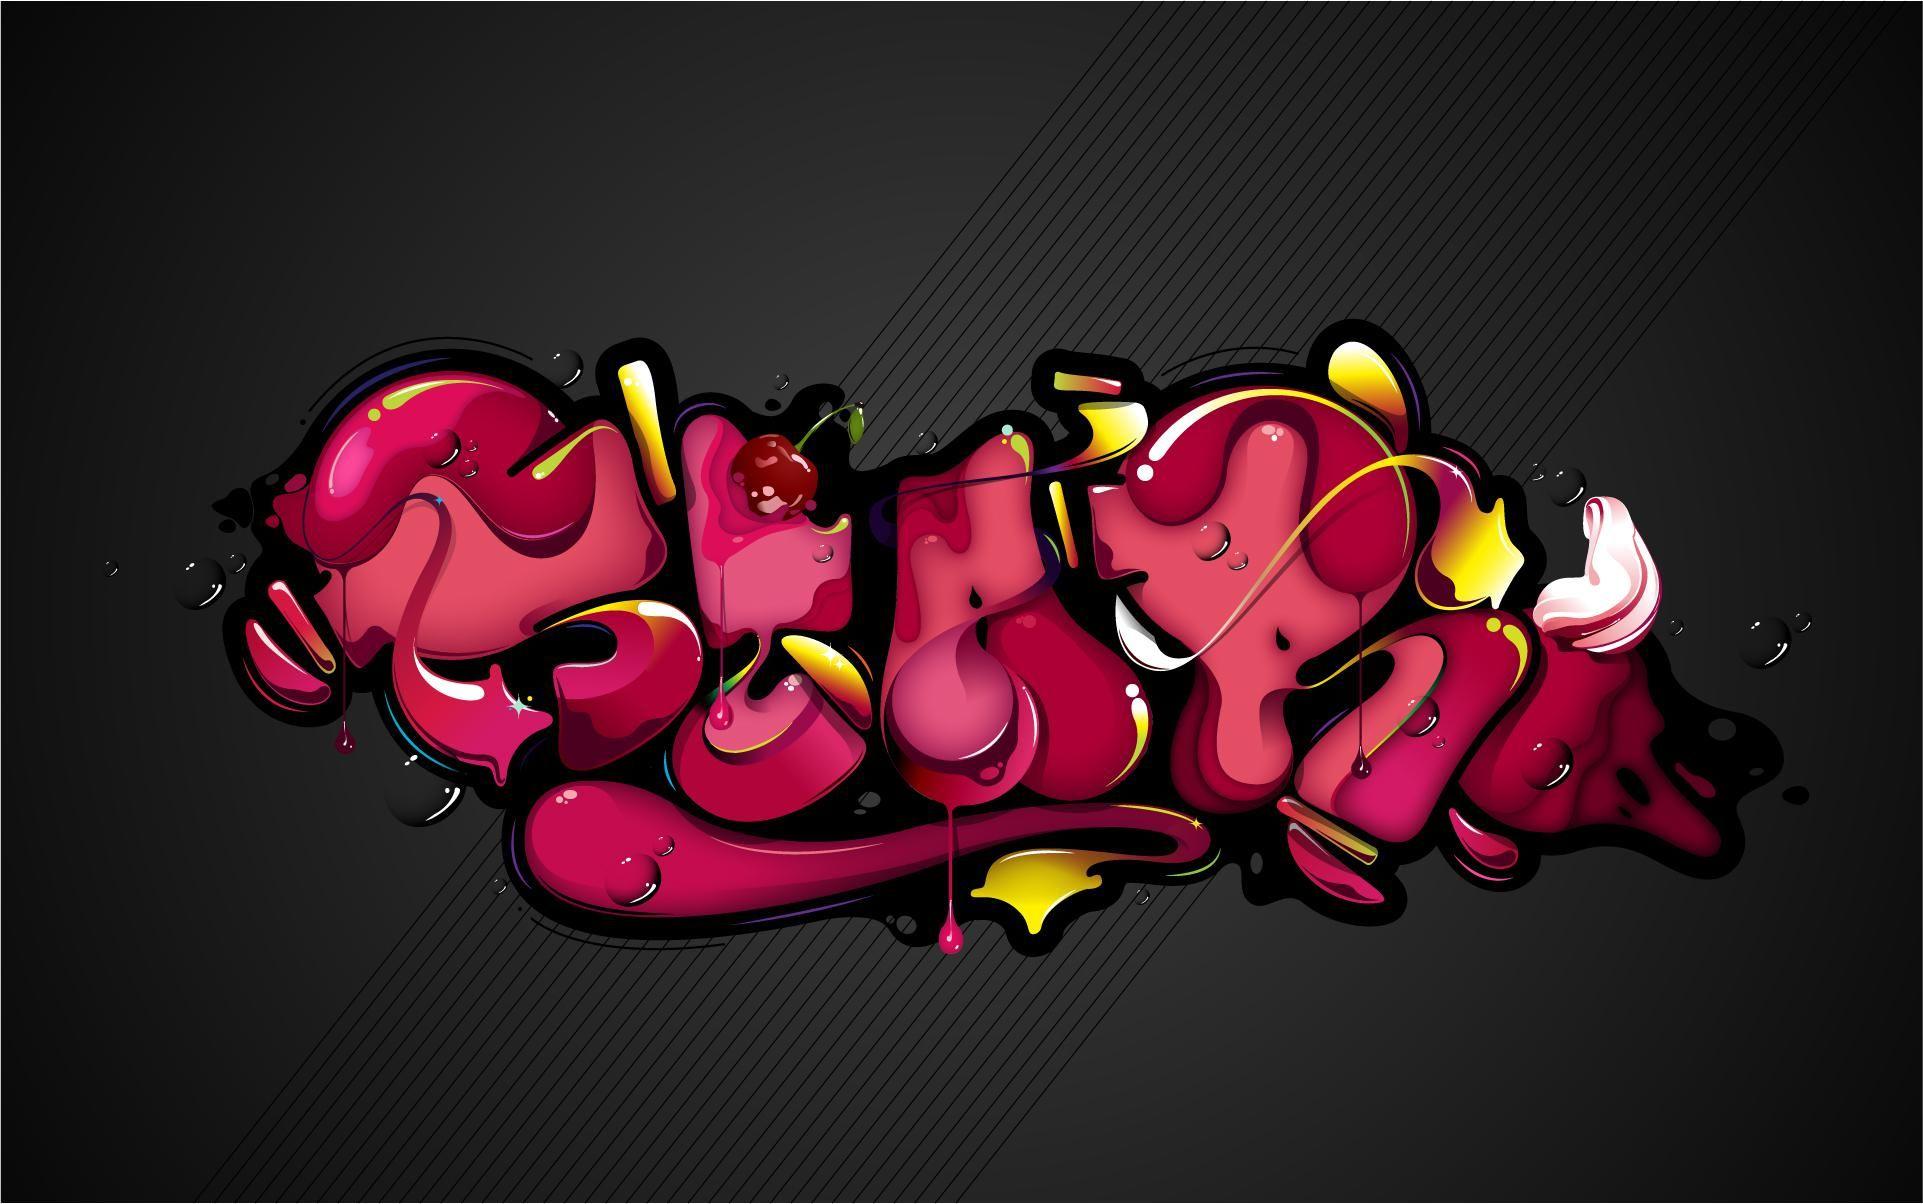 Color art digital - Nice Cg Digital Art High Definition 3d Wallpapers For Desktop Graffiti Color Urban Download Wallpaper Check